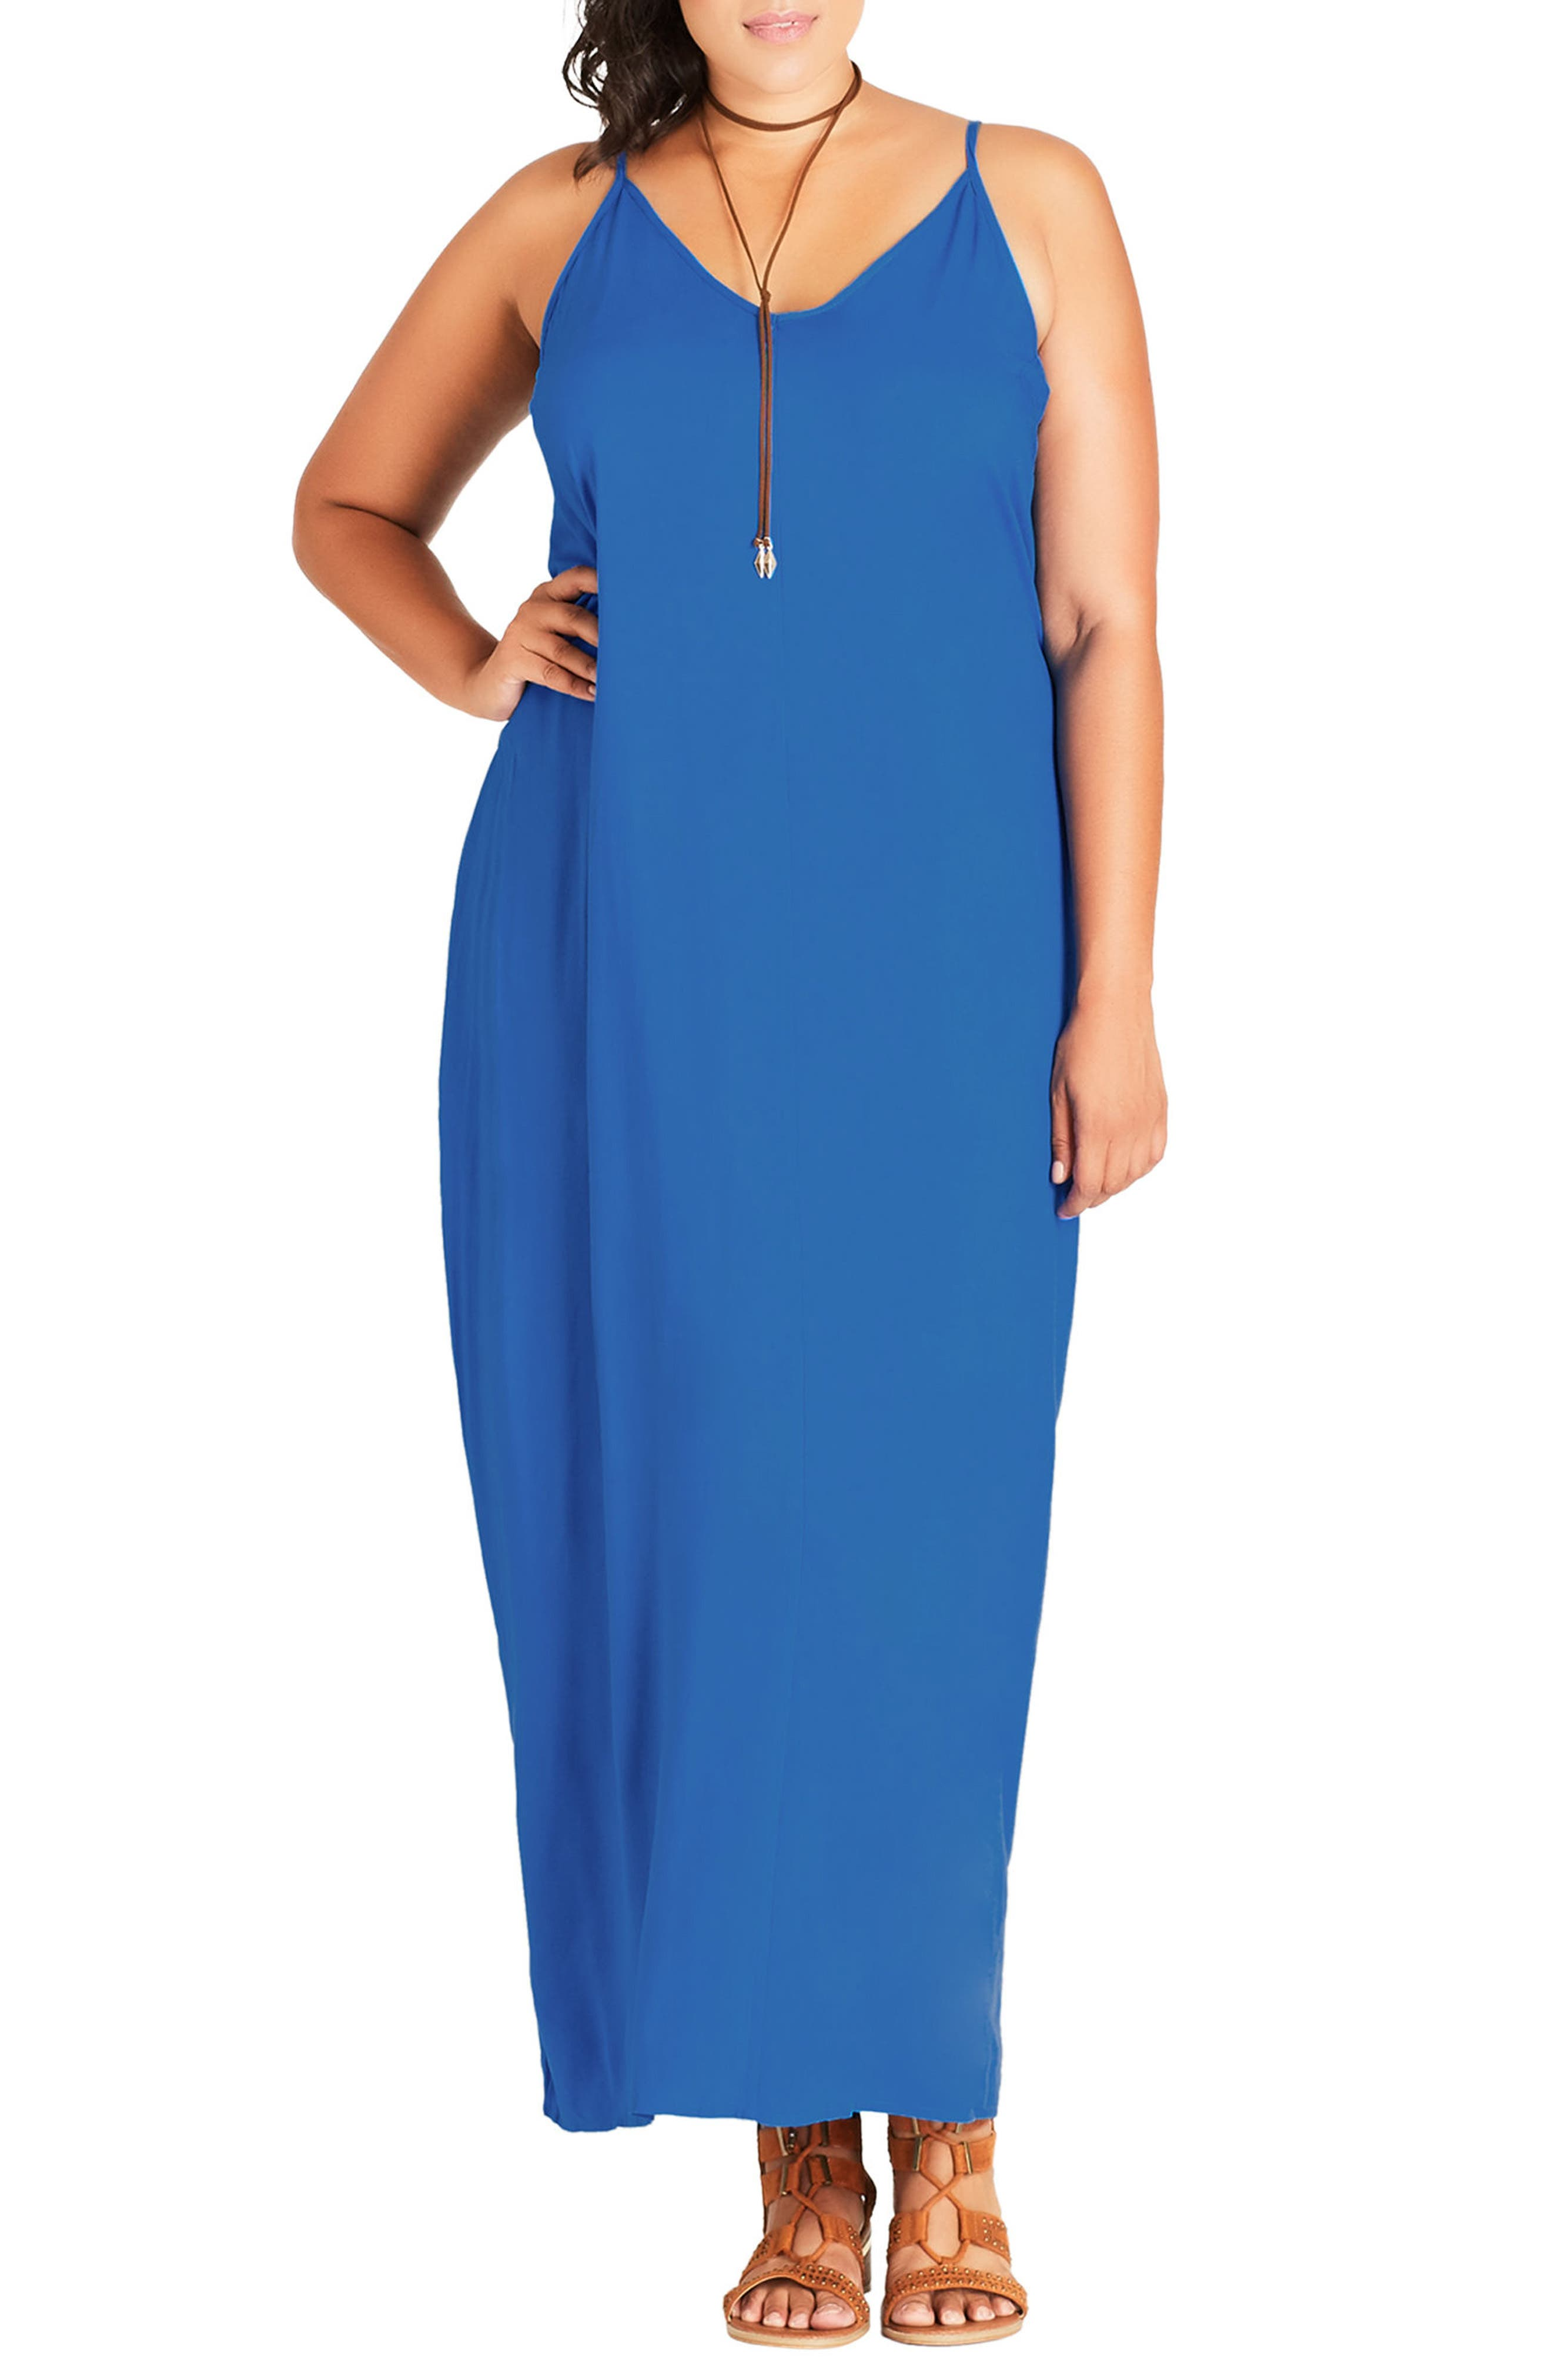 Alternate Image 1 Selected - City Chic V-Neck Maxi Dress (Plus Size)